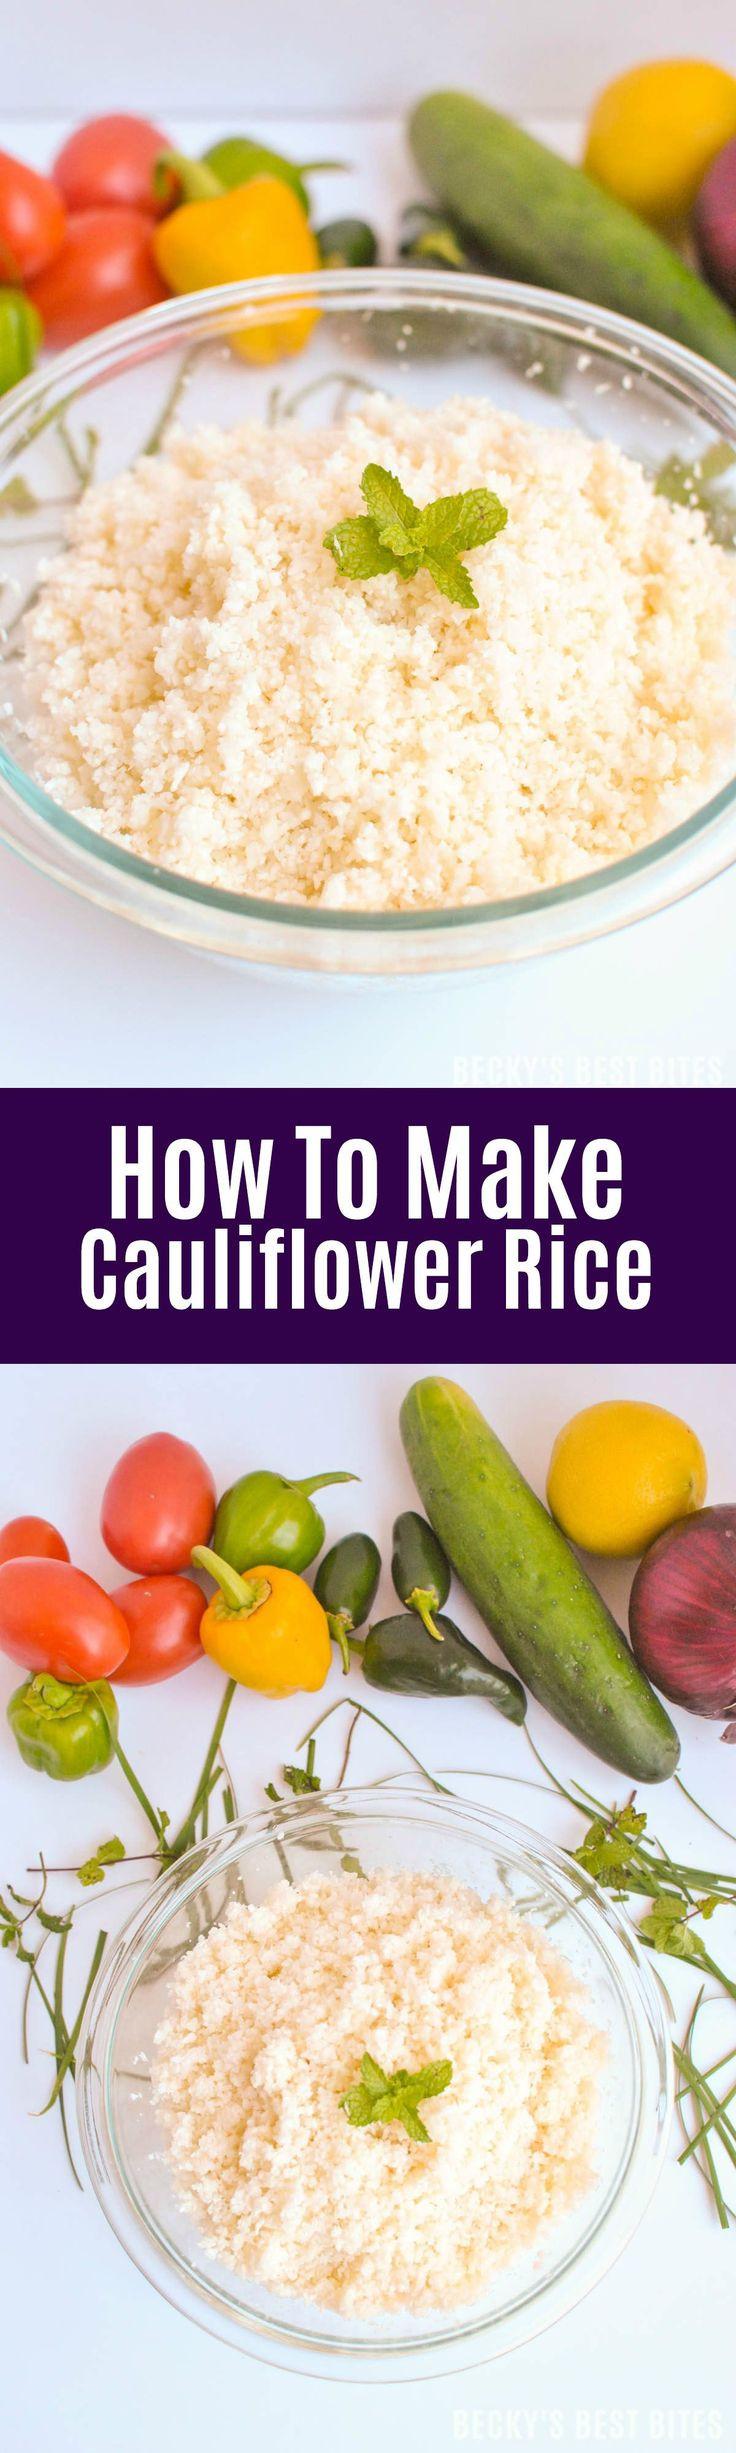 High Fiber Low Carb Recipes  25 best ideas about Fiber t on Pinterest